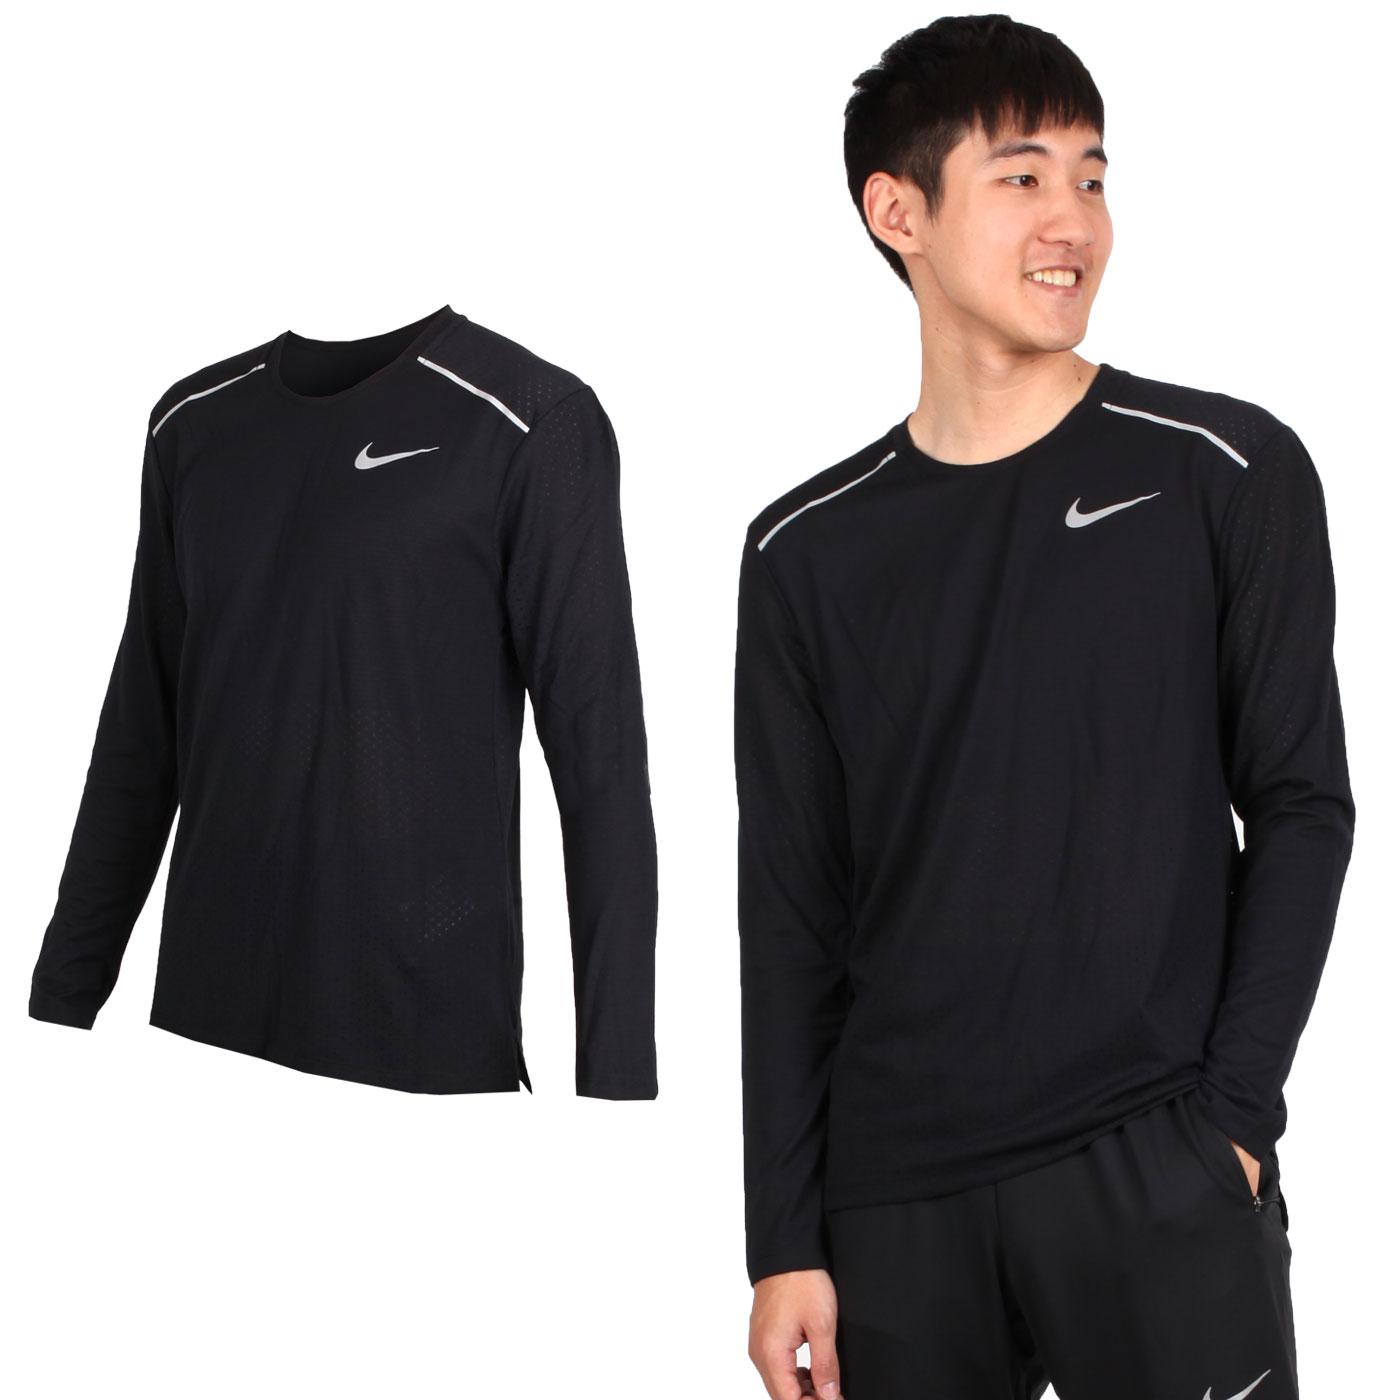 NIKE 男款運動長袖T恤 AQ9924010 - 黑銀